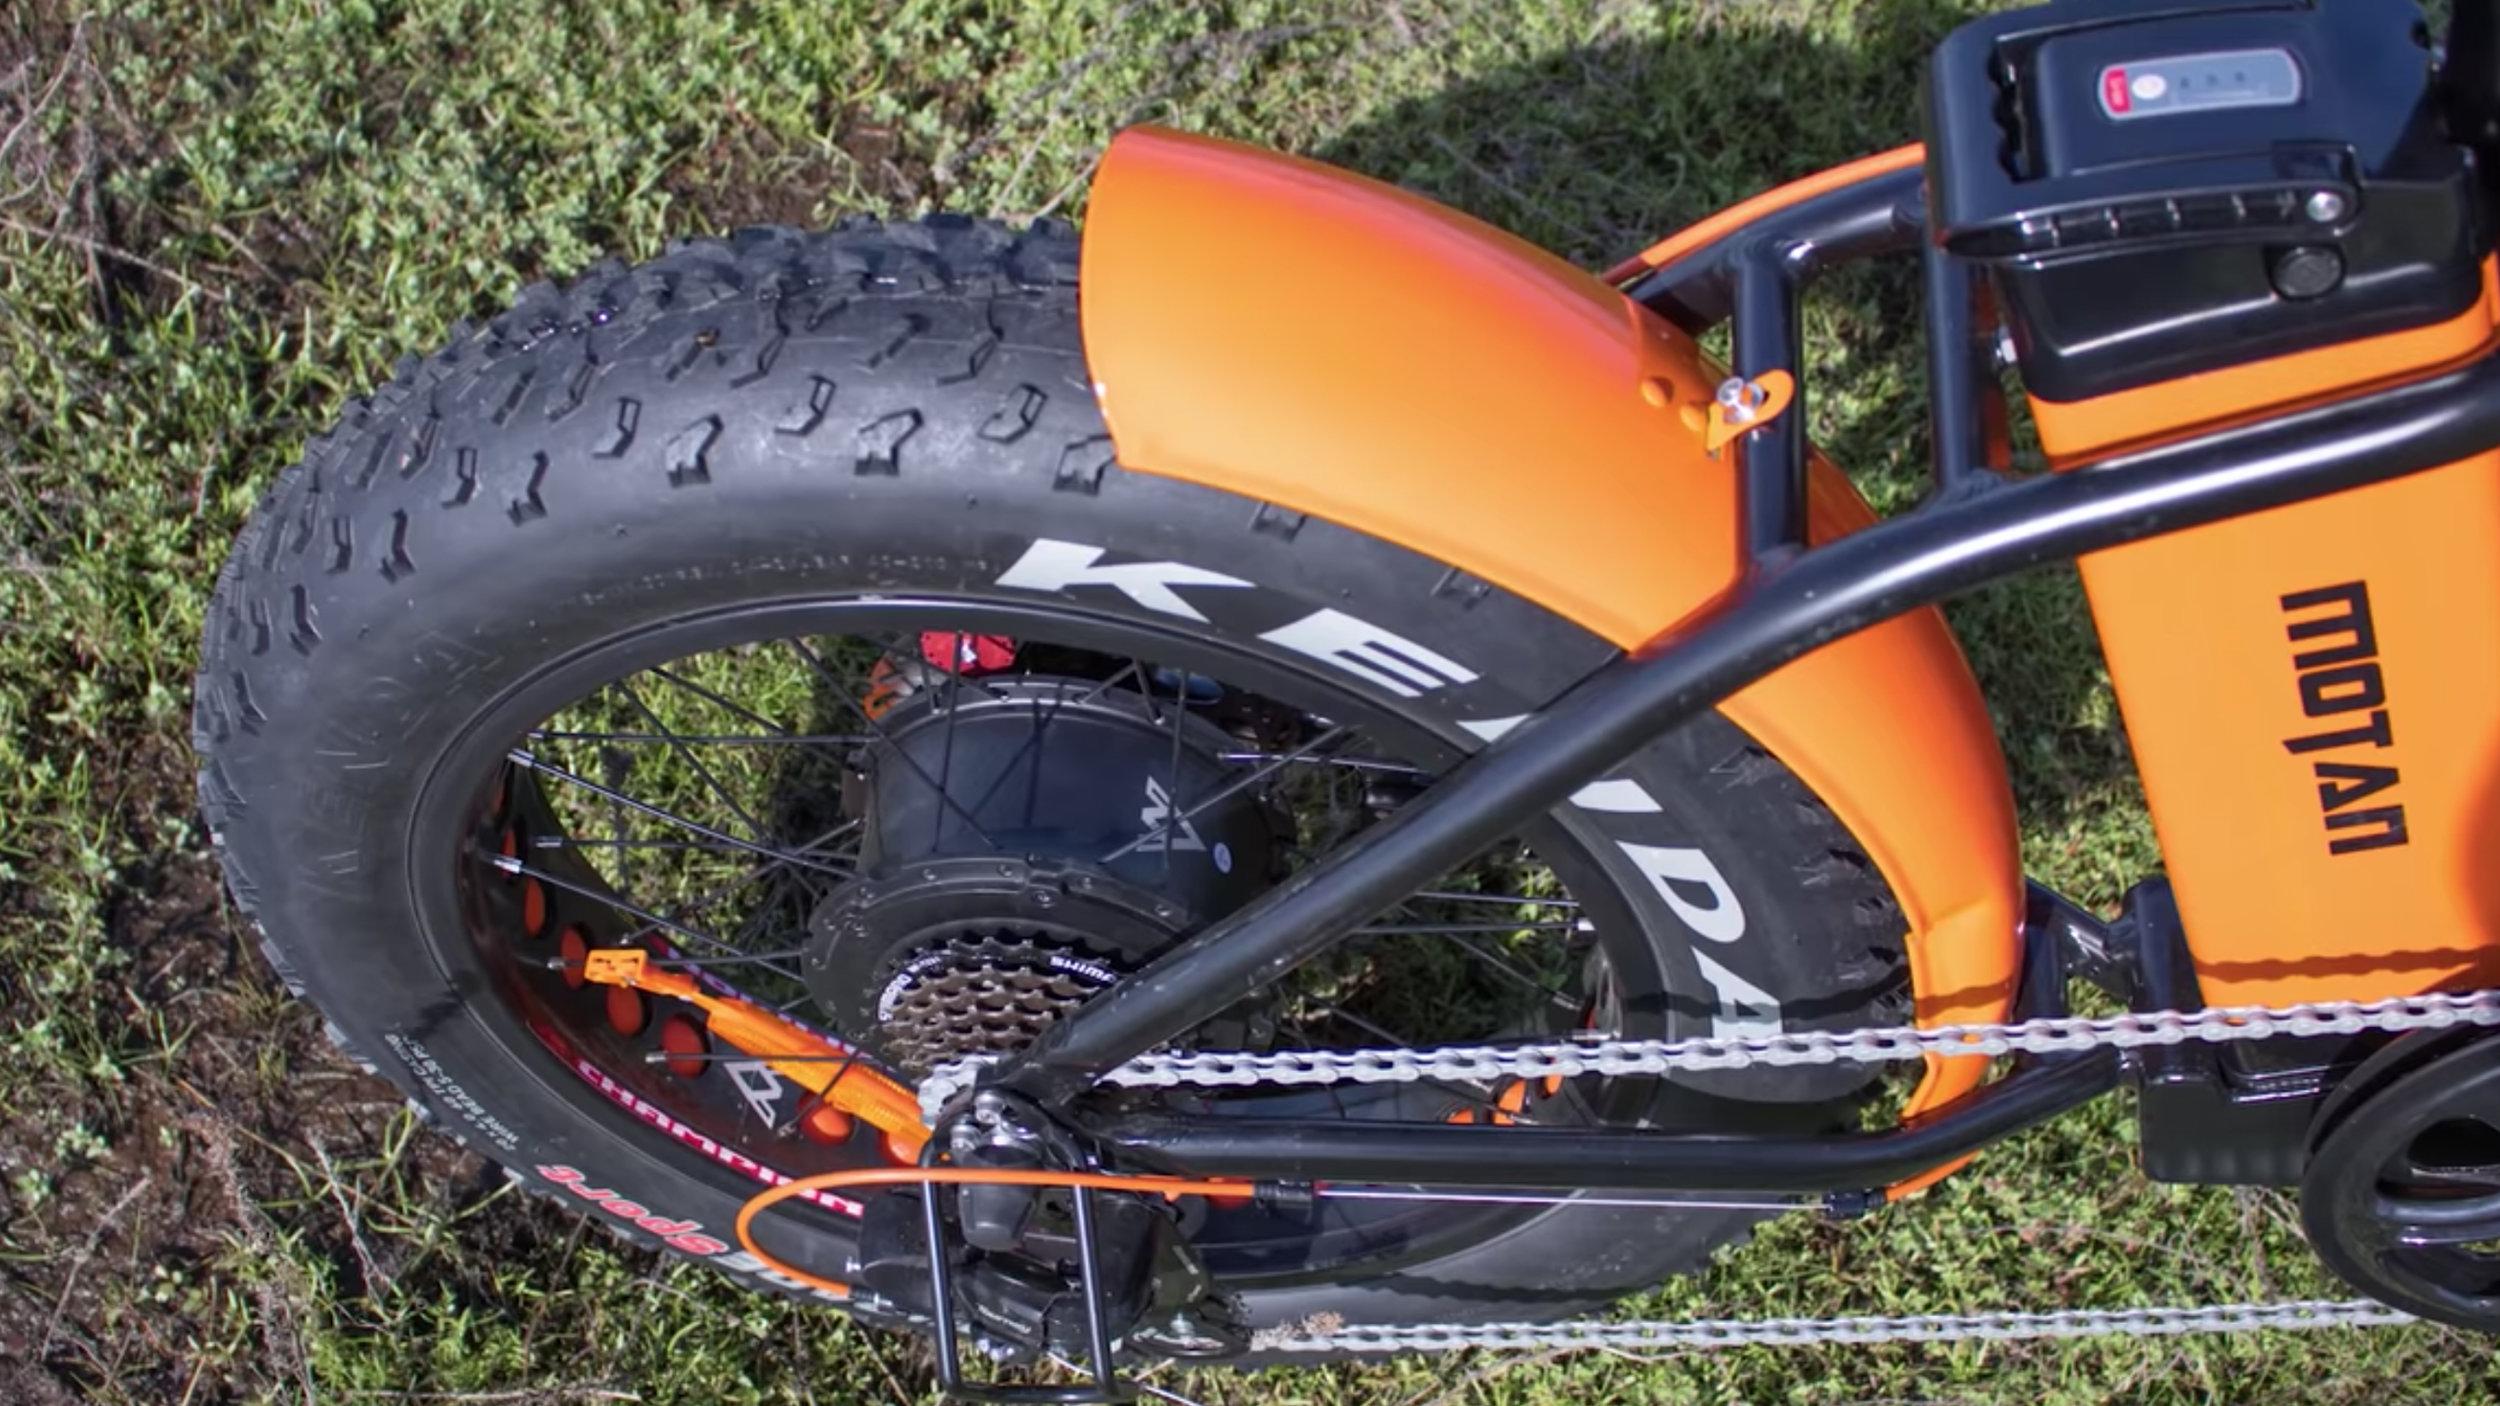 electrified-reviews-addmotor-motan-m150p7-electric-bike-review-bafang-motor.jpg